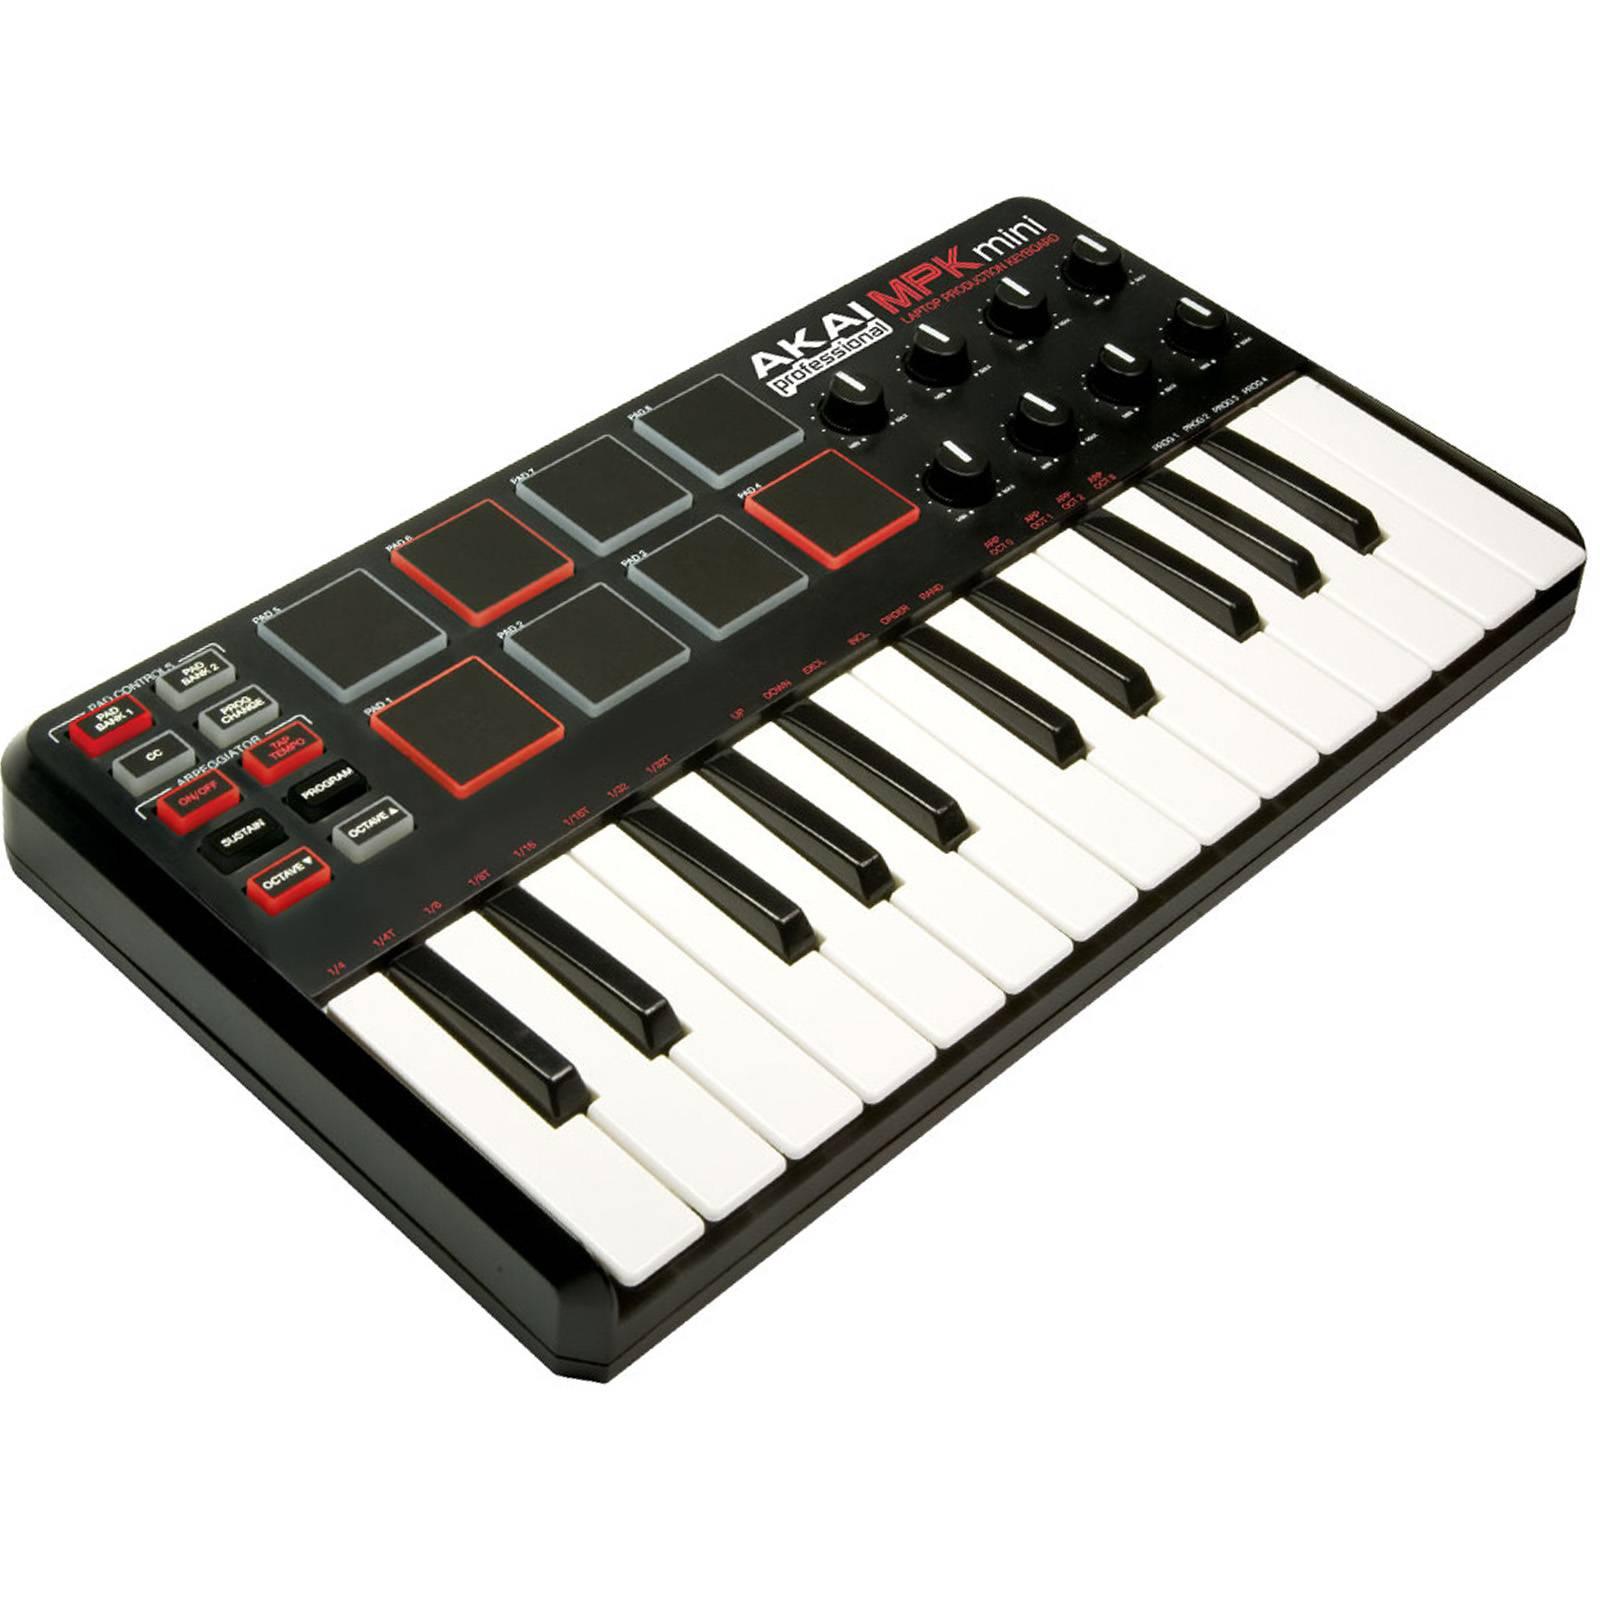 akai mpk mini mk1 laptop production keyboard ebay. Black Bedroom Furniture Sets. Home Design Ideas